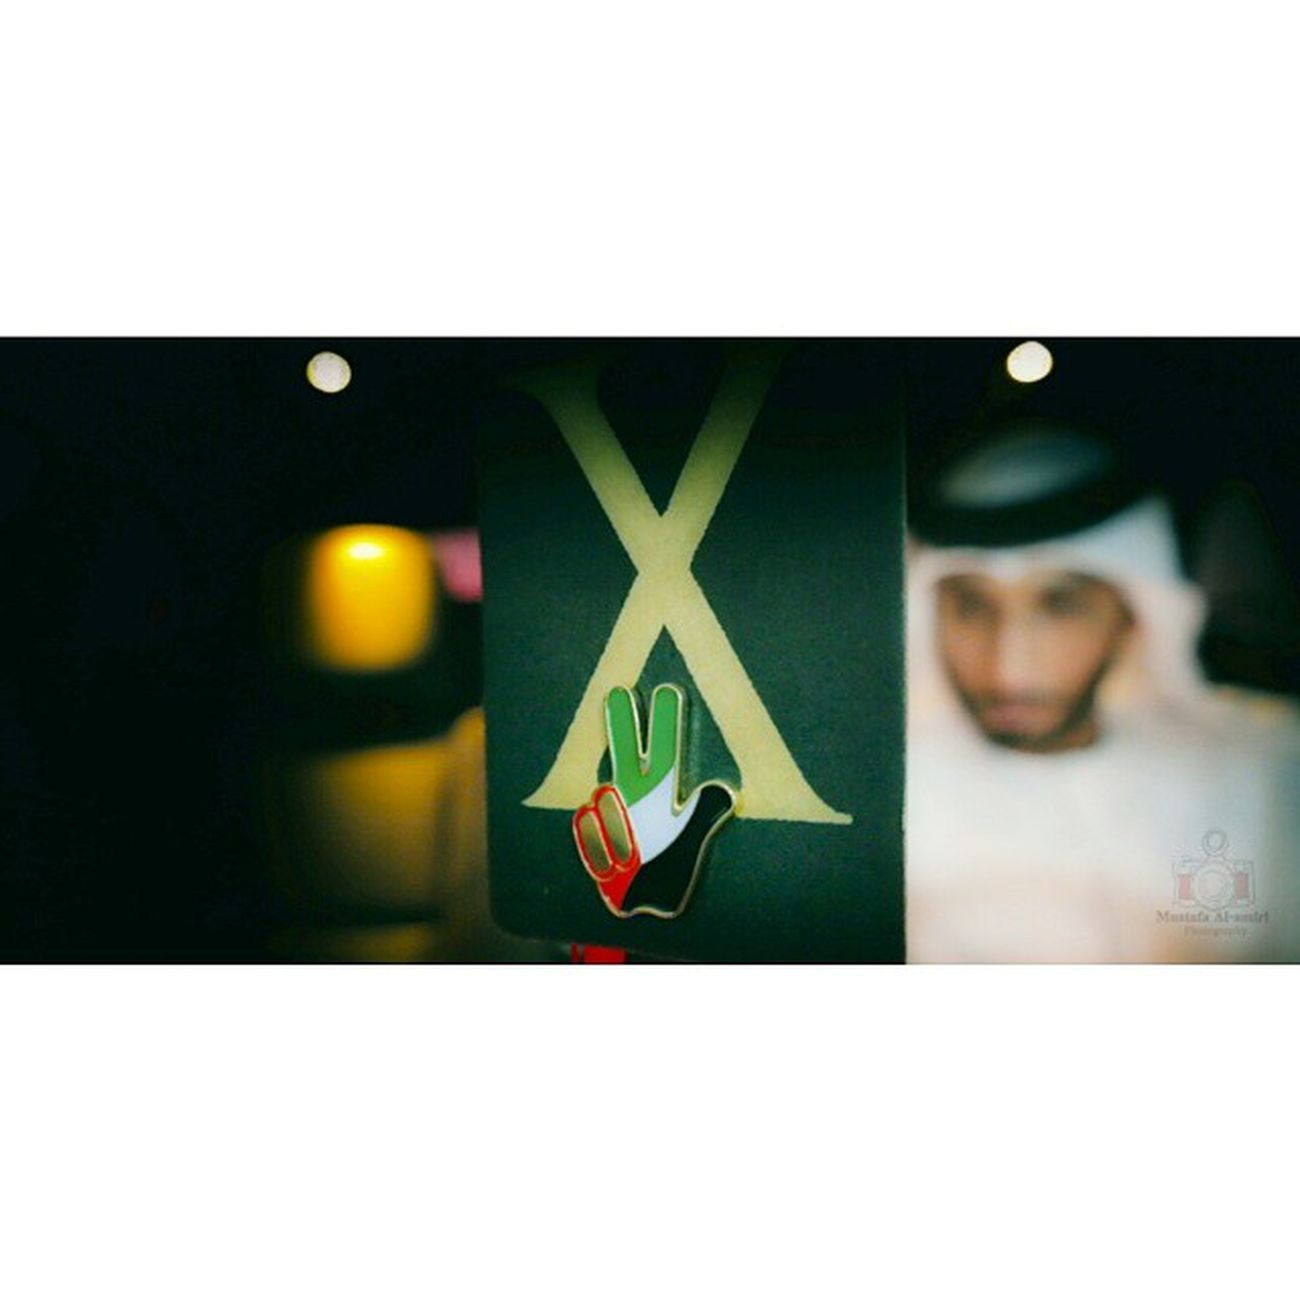 My UAE Dubai Fazza3 F3 Hamdan Hamdan_bin_mohammed الامارات Hhshkmohd Mydubai الشيخ DXB Crown_Prince Hamdanbinmohammed Pic MyUAE Crownprinceofdubai دبي Fazza Fazzaforum Emirate Hmrm Follow Fansfazza3_indo Almaktoum World abudhabi faza3 ولي_عهد repost group63